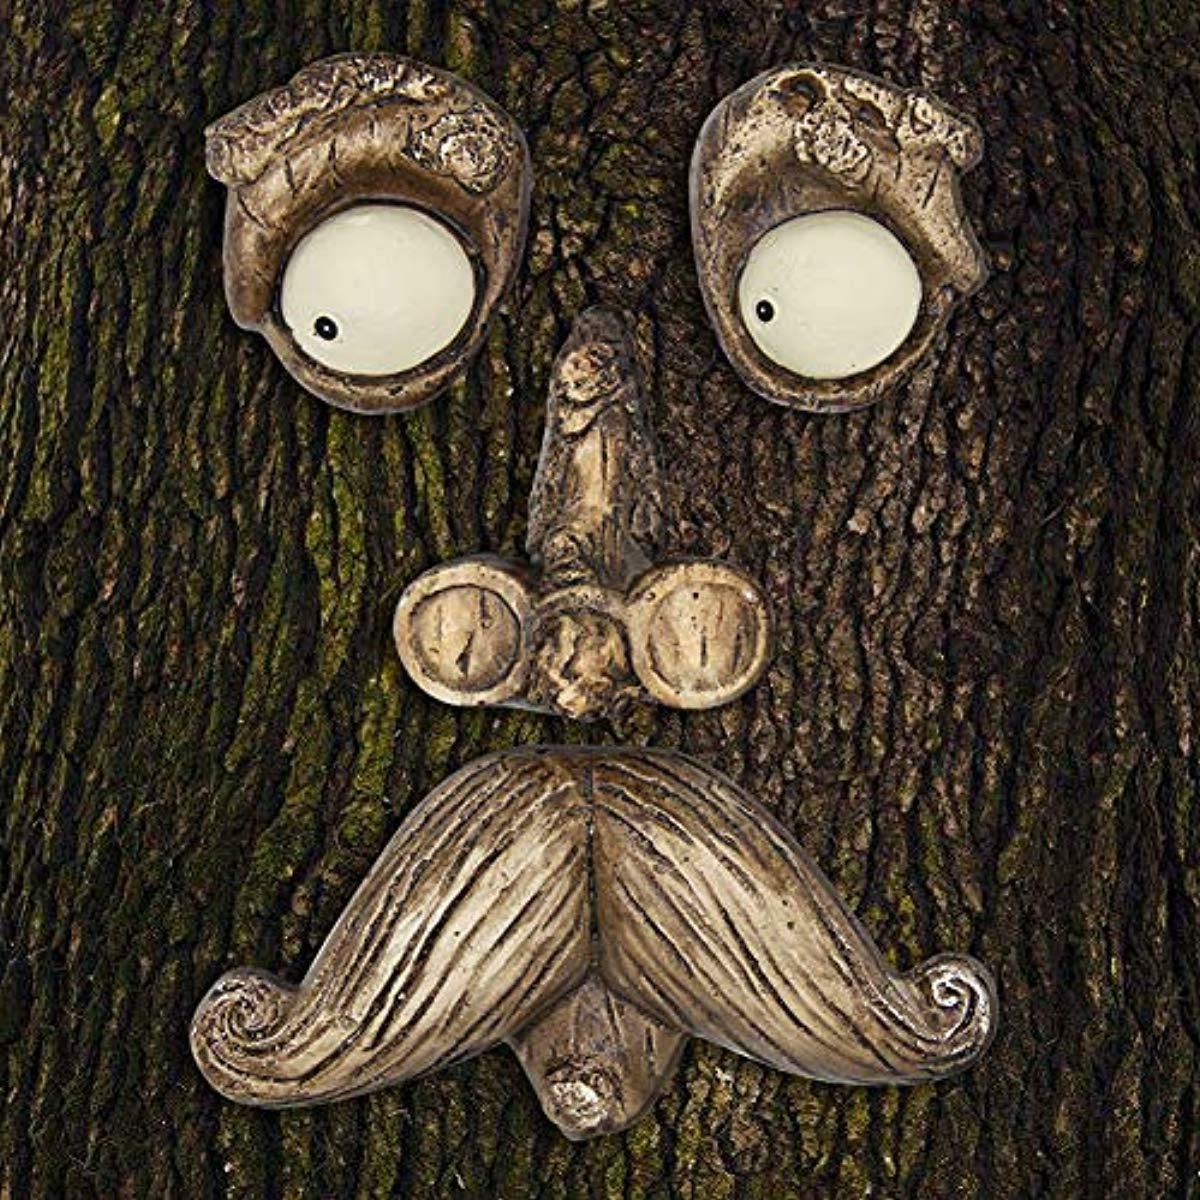 old man tree hugger yard art decorations